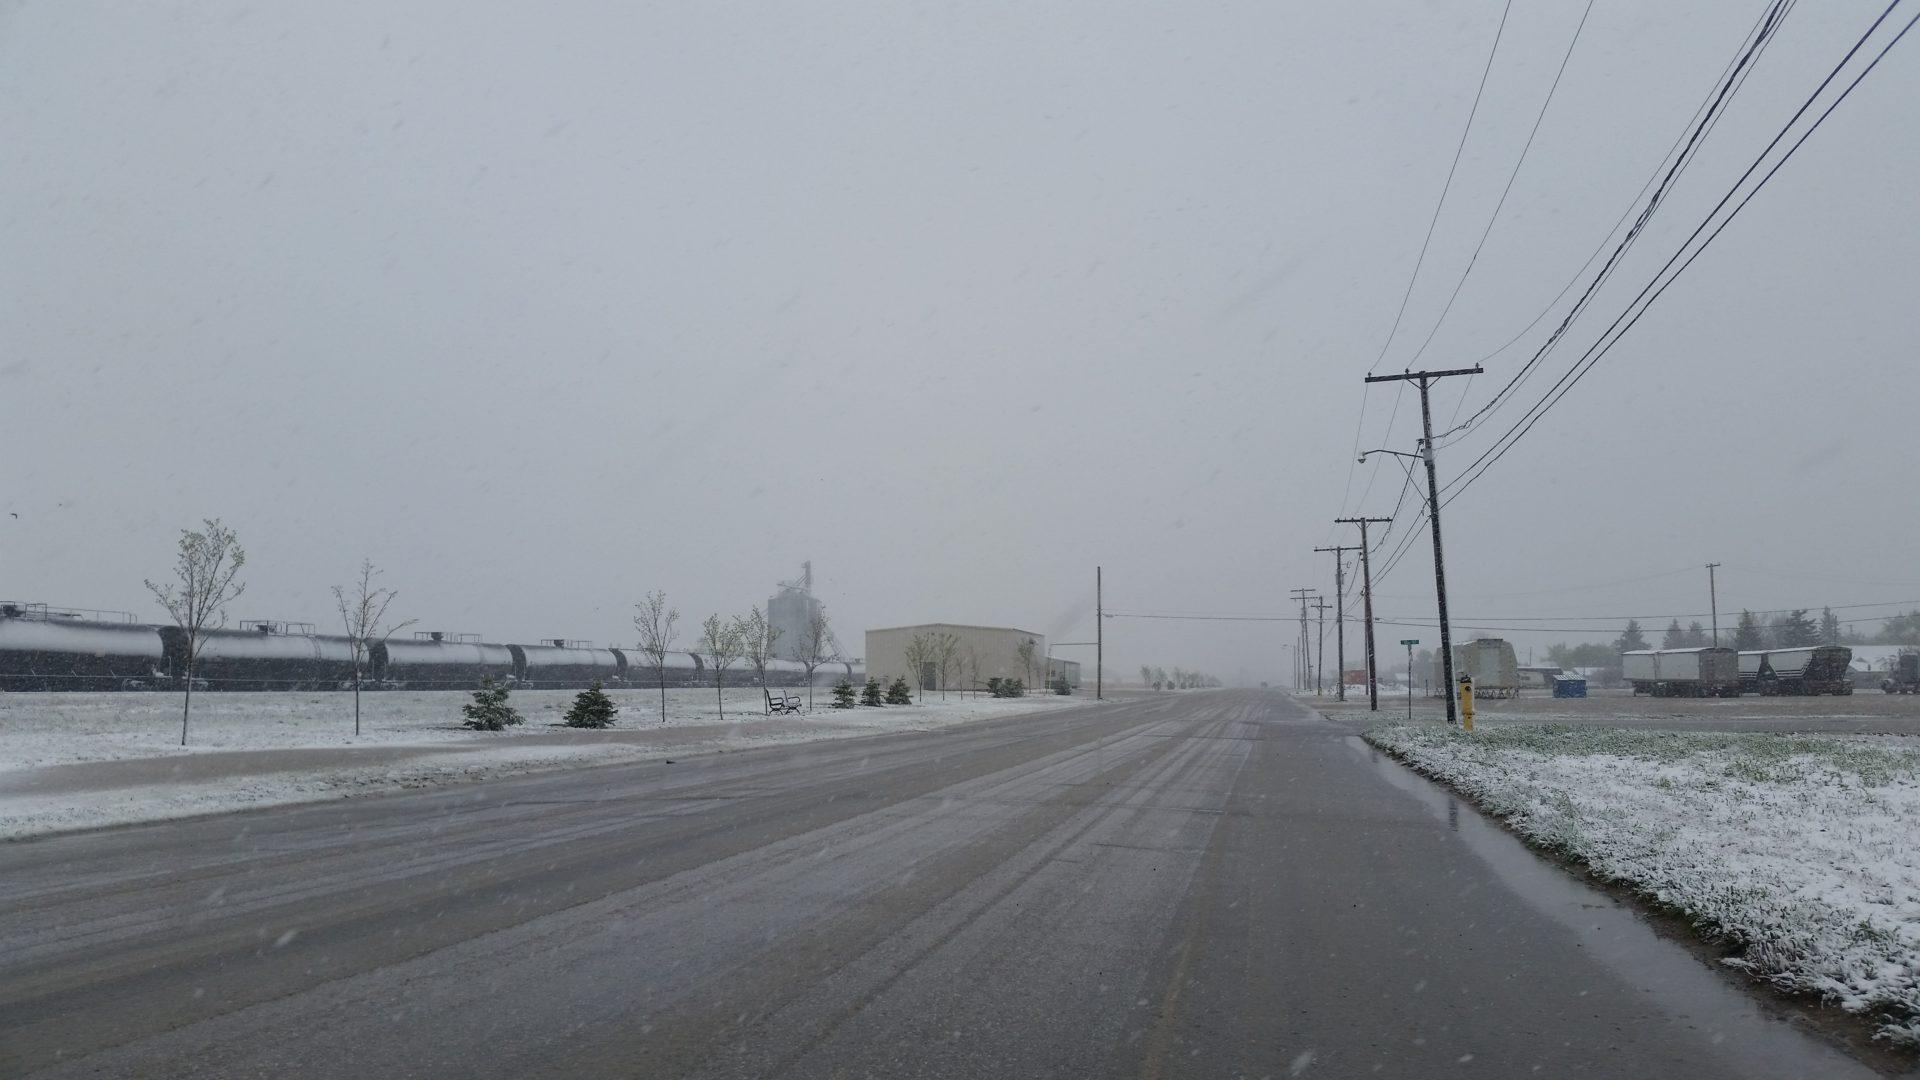 Slick Road Conditions